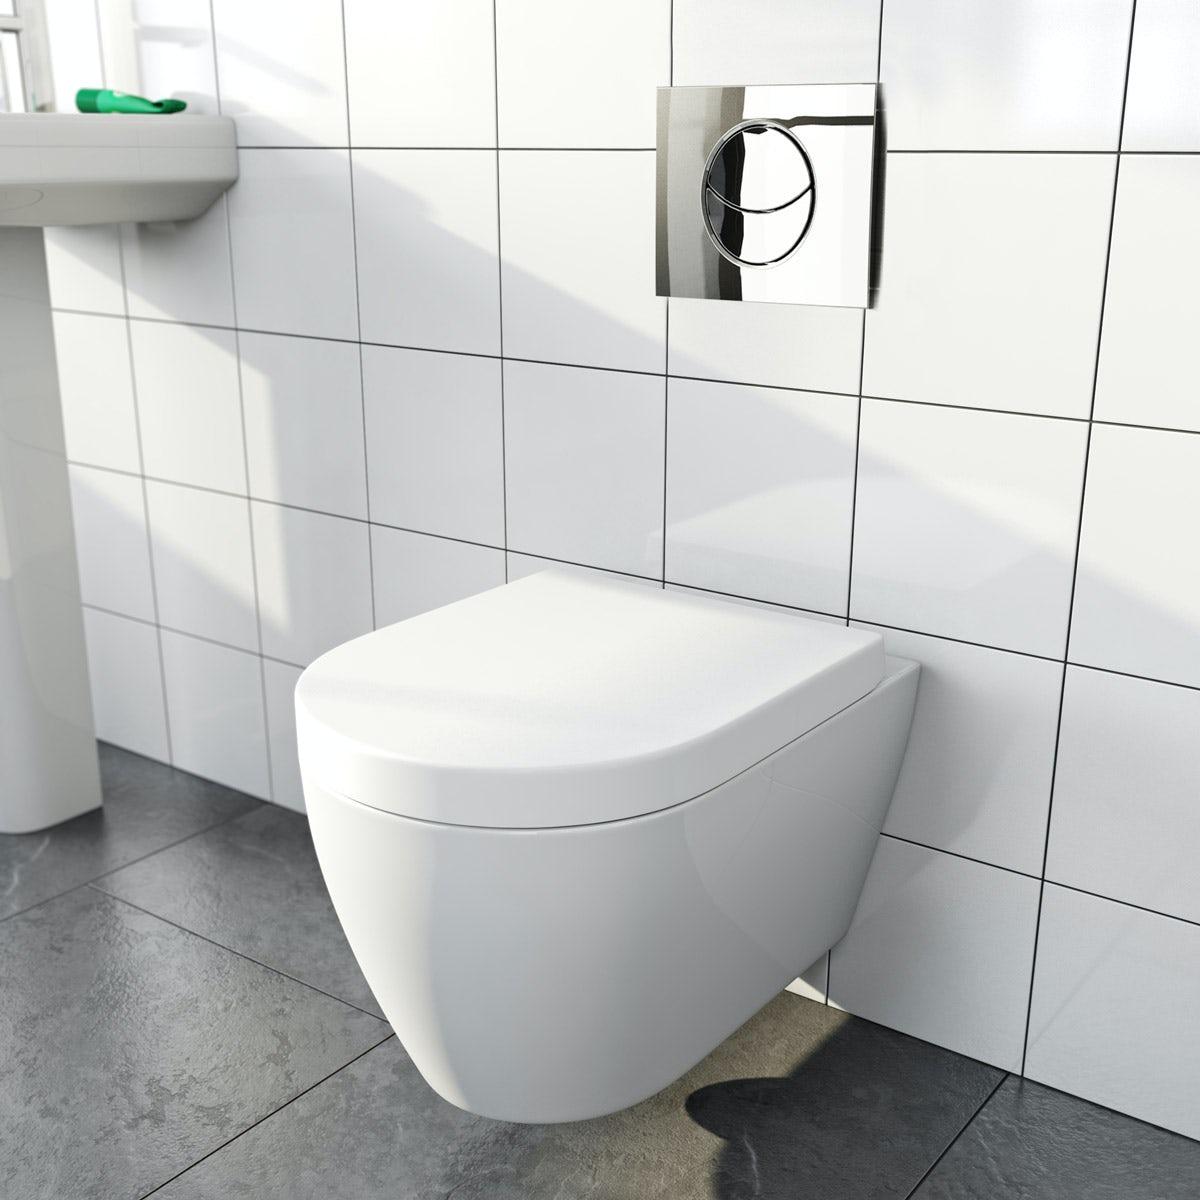 opal wall hung toilet inc soft close seat - Wall Hung Toilet